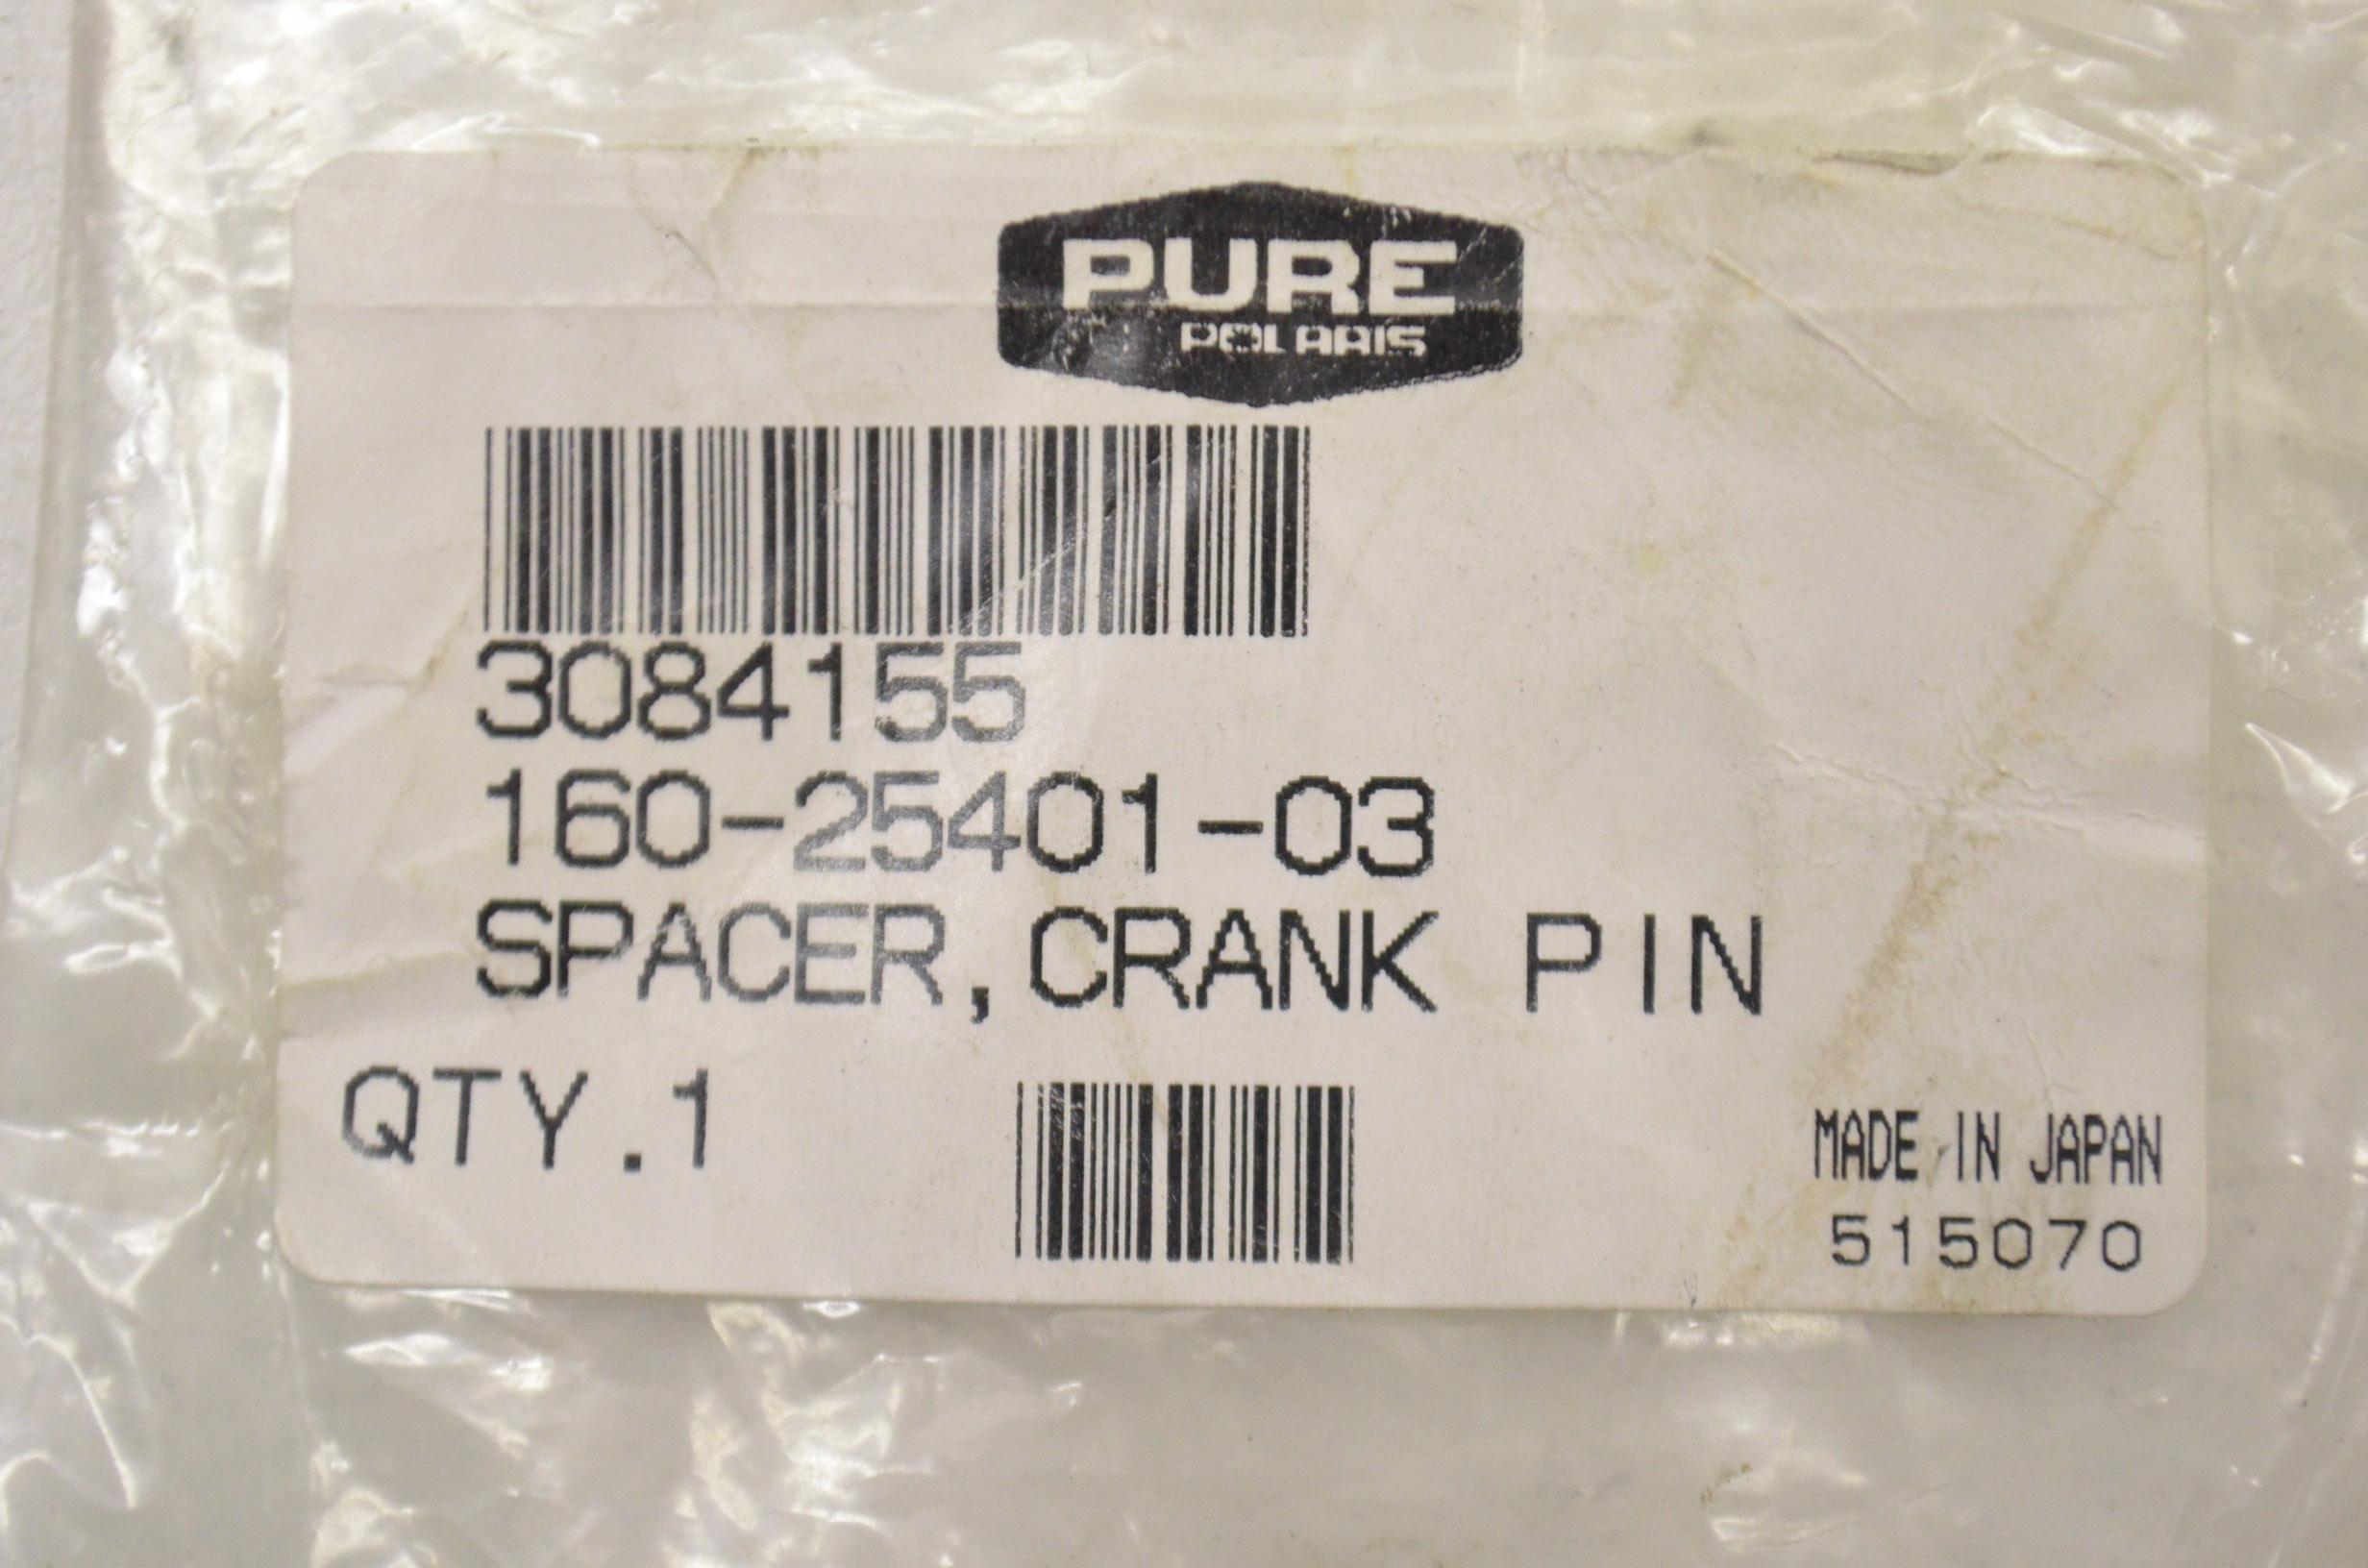 Polaris New OEM Crank Pin Spacer 3084155 ATV, Side-by-Side & UTV ...